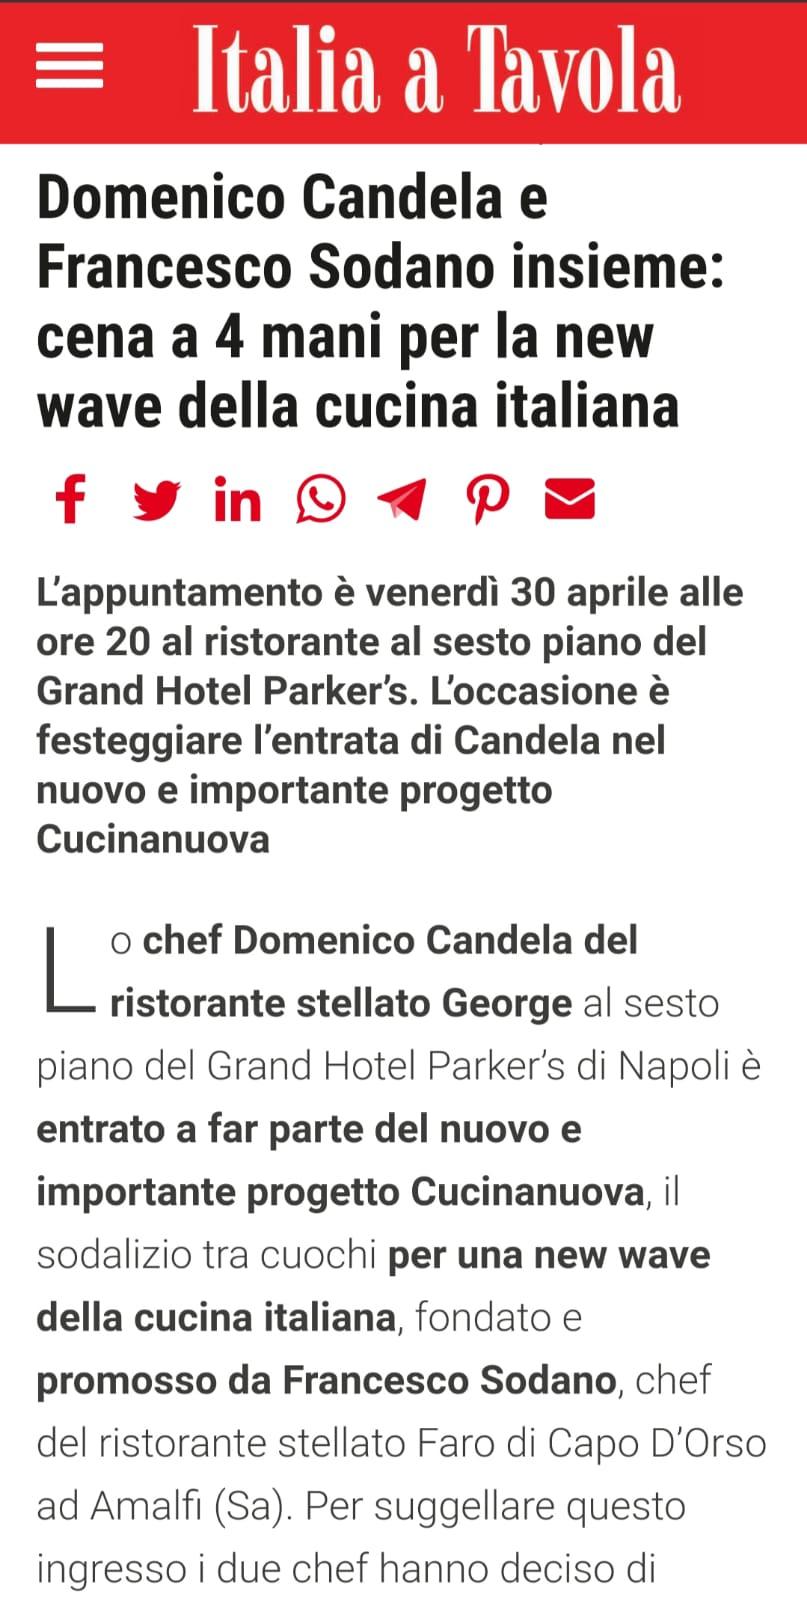 GRAND HOTEL PARKER'S – ITALIA A TAVOLA – APRILE 2021